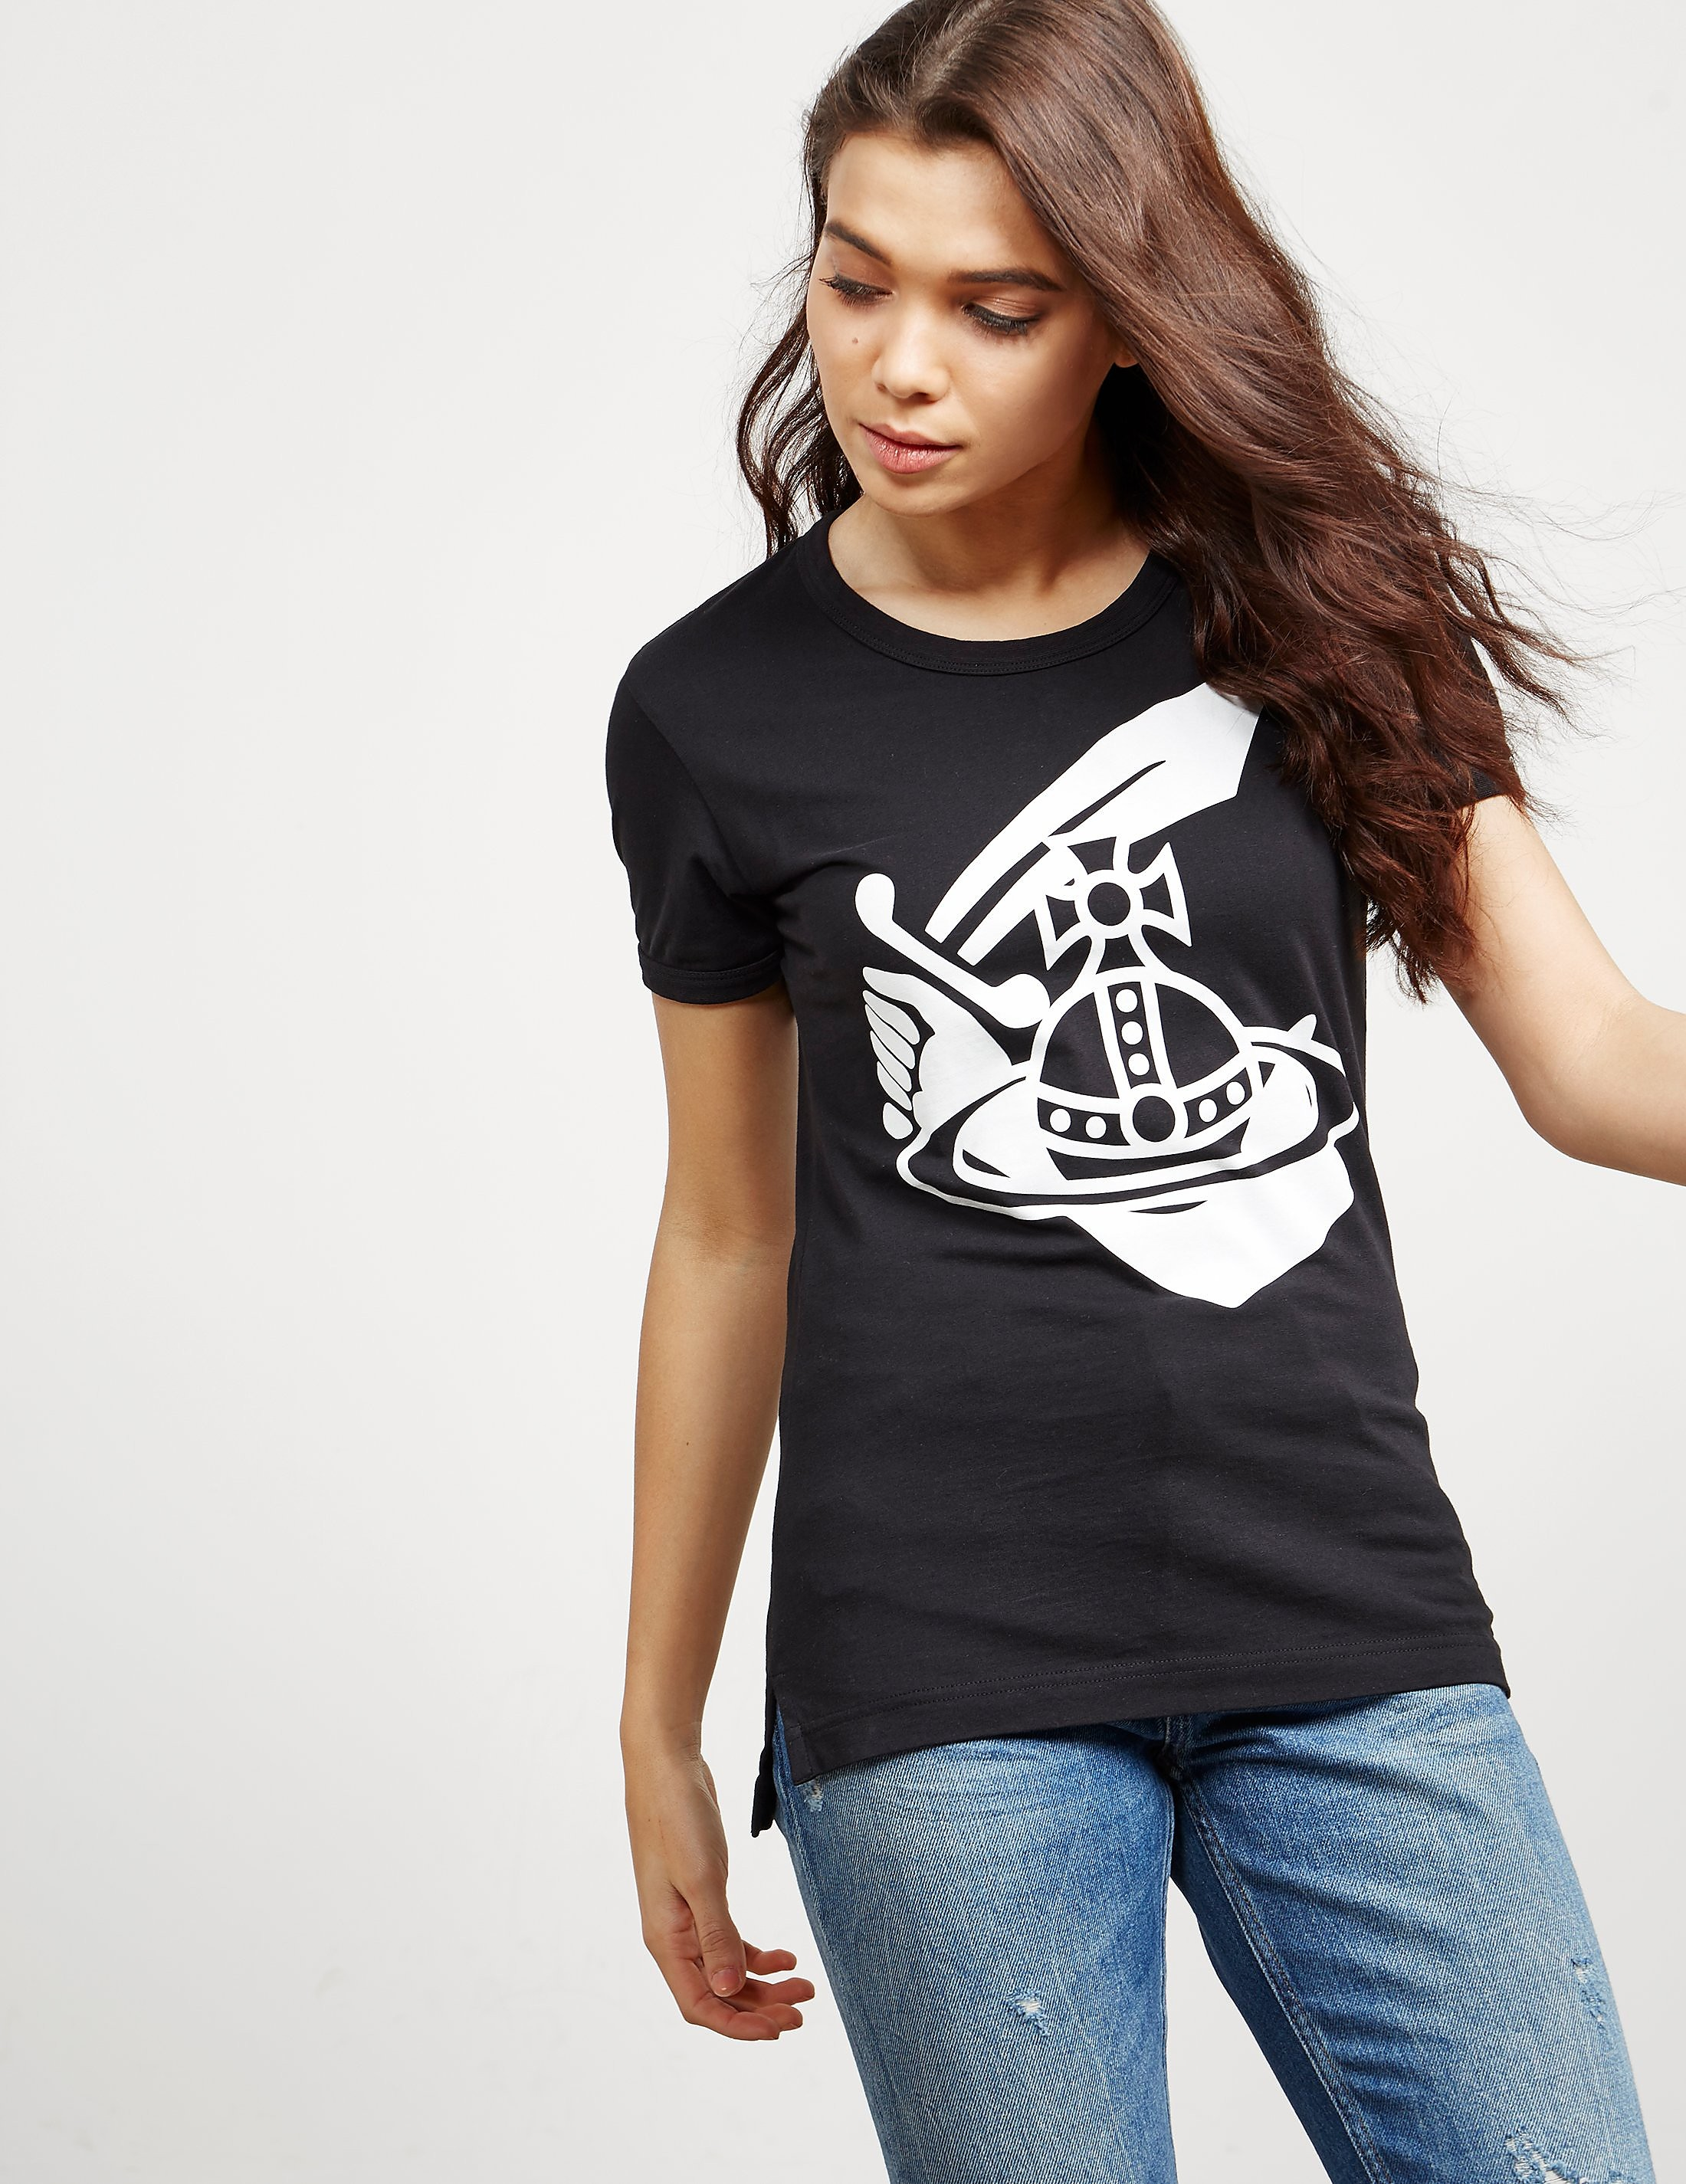 Vivienne Westwood Anglomania Cutlass Orb Short Sleeve T-Shirt